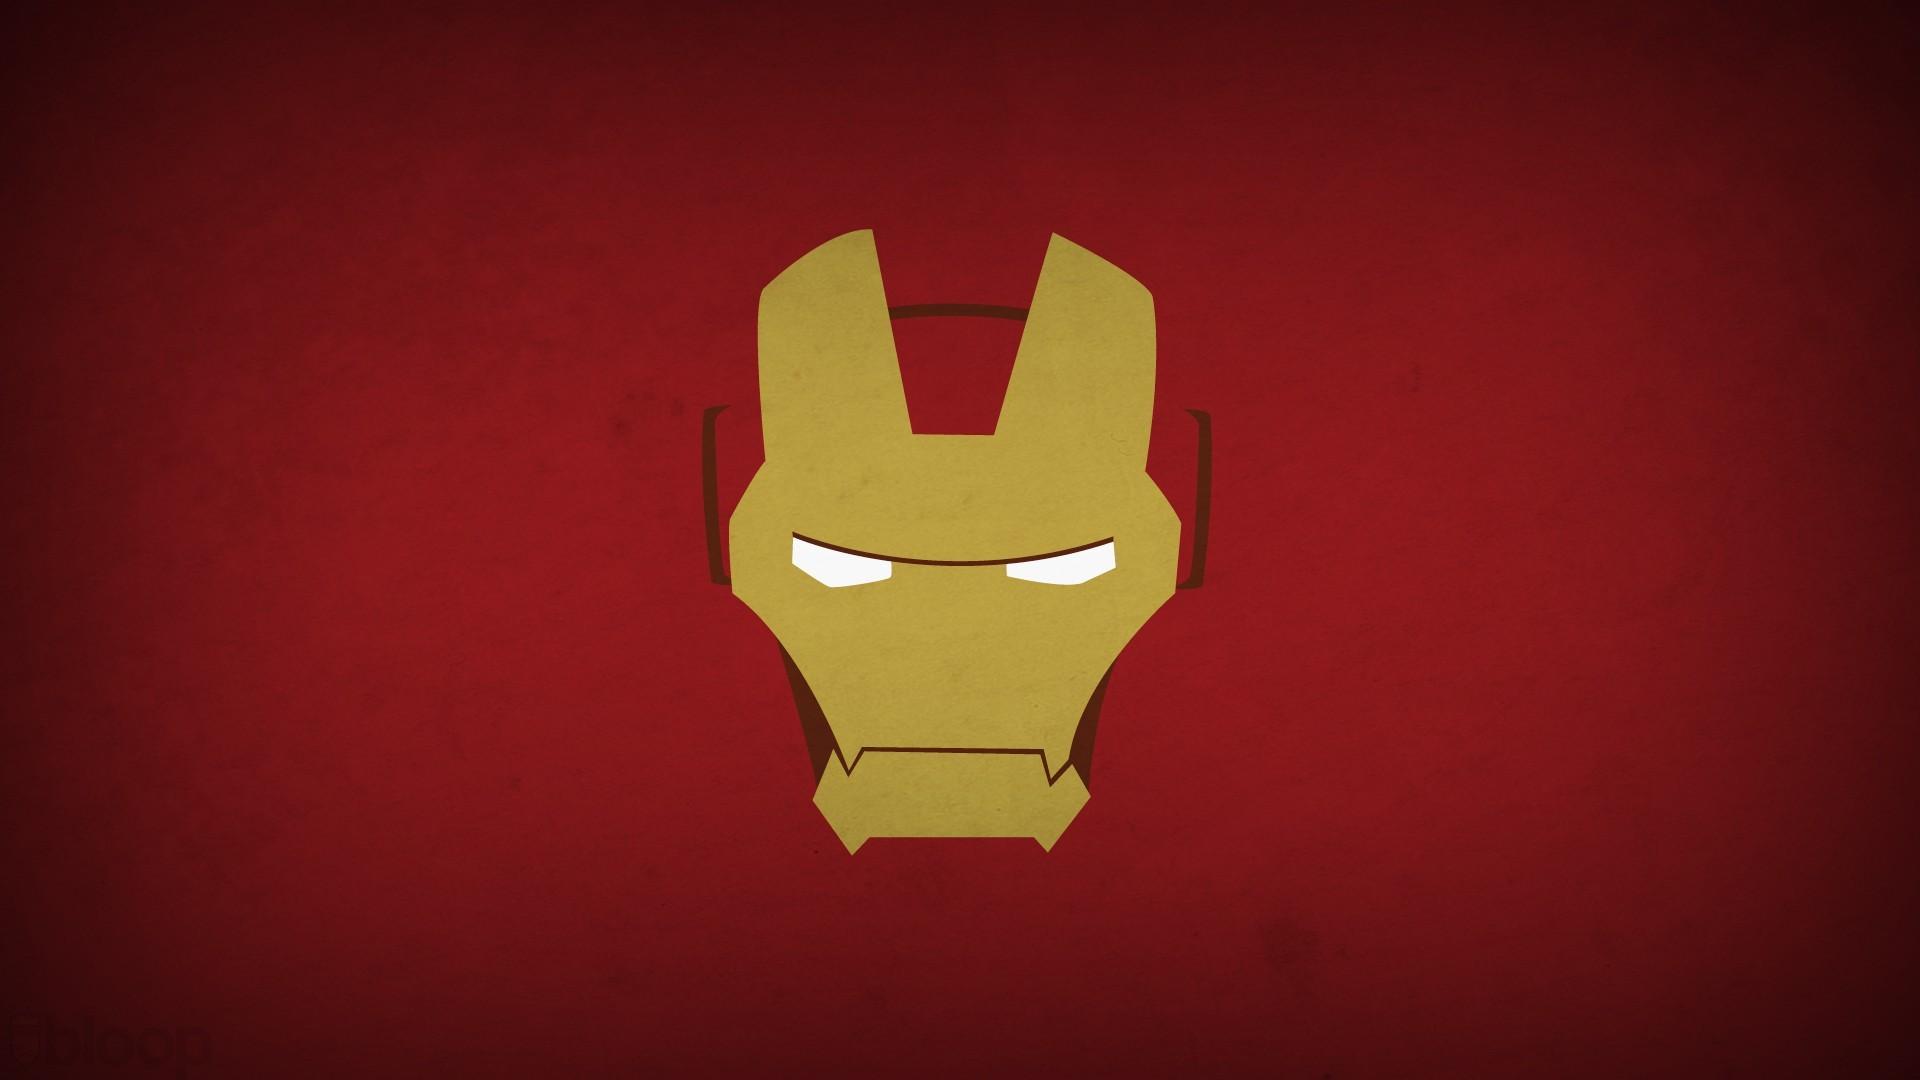 General 1920x1080 minimalism superhero Iron Man Marvel Comics hero Blo0p red background